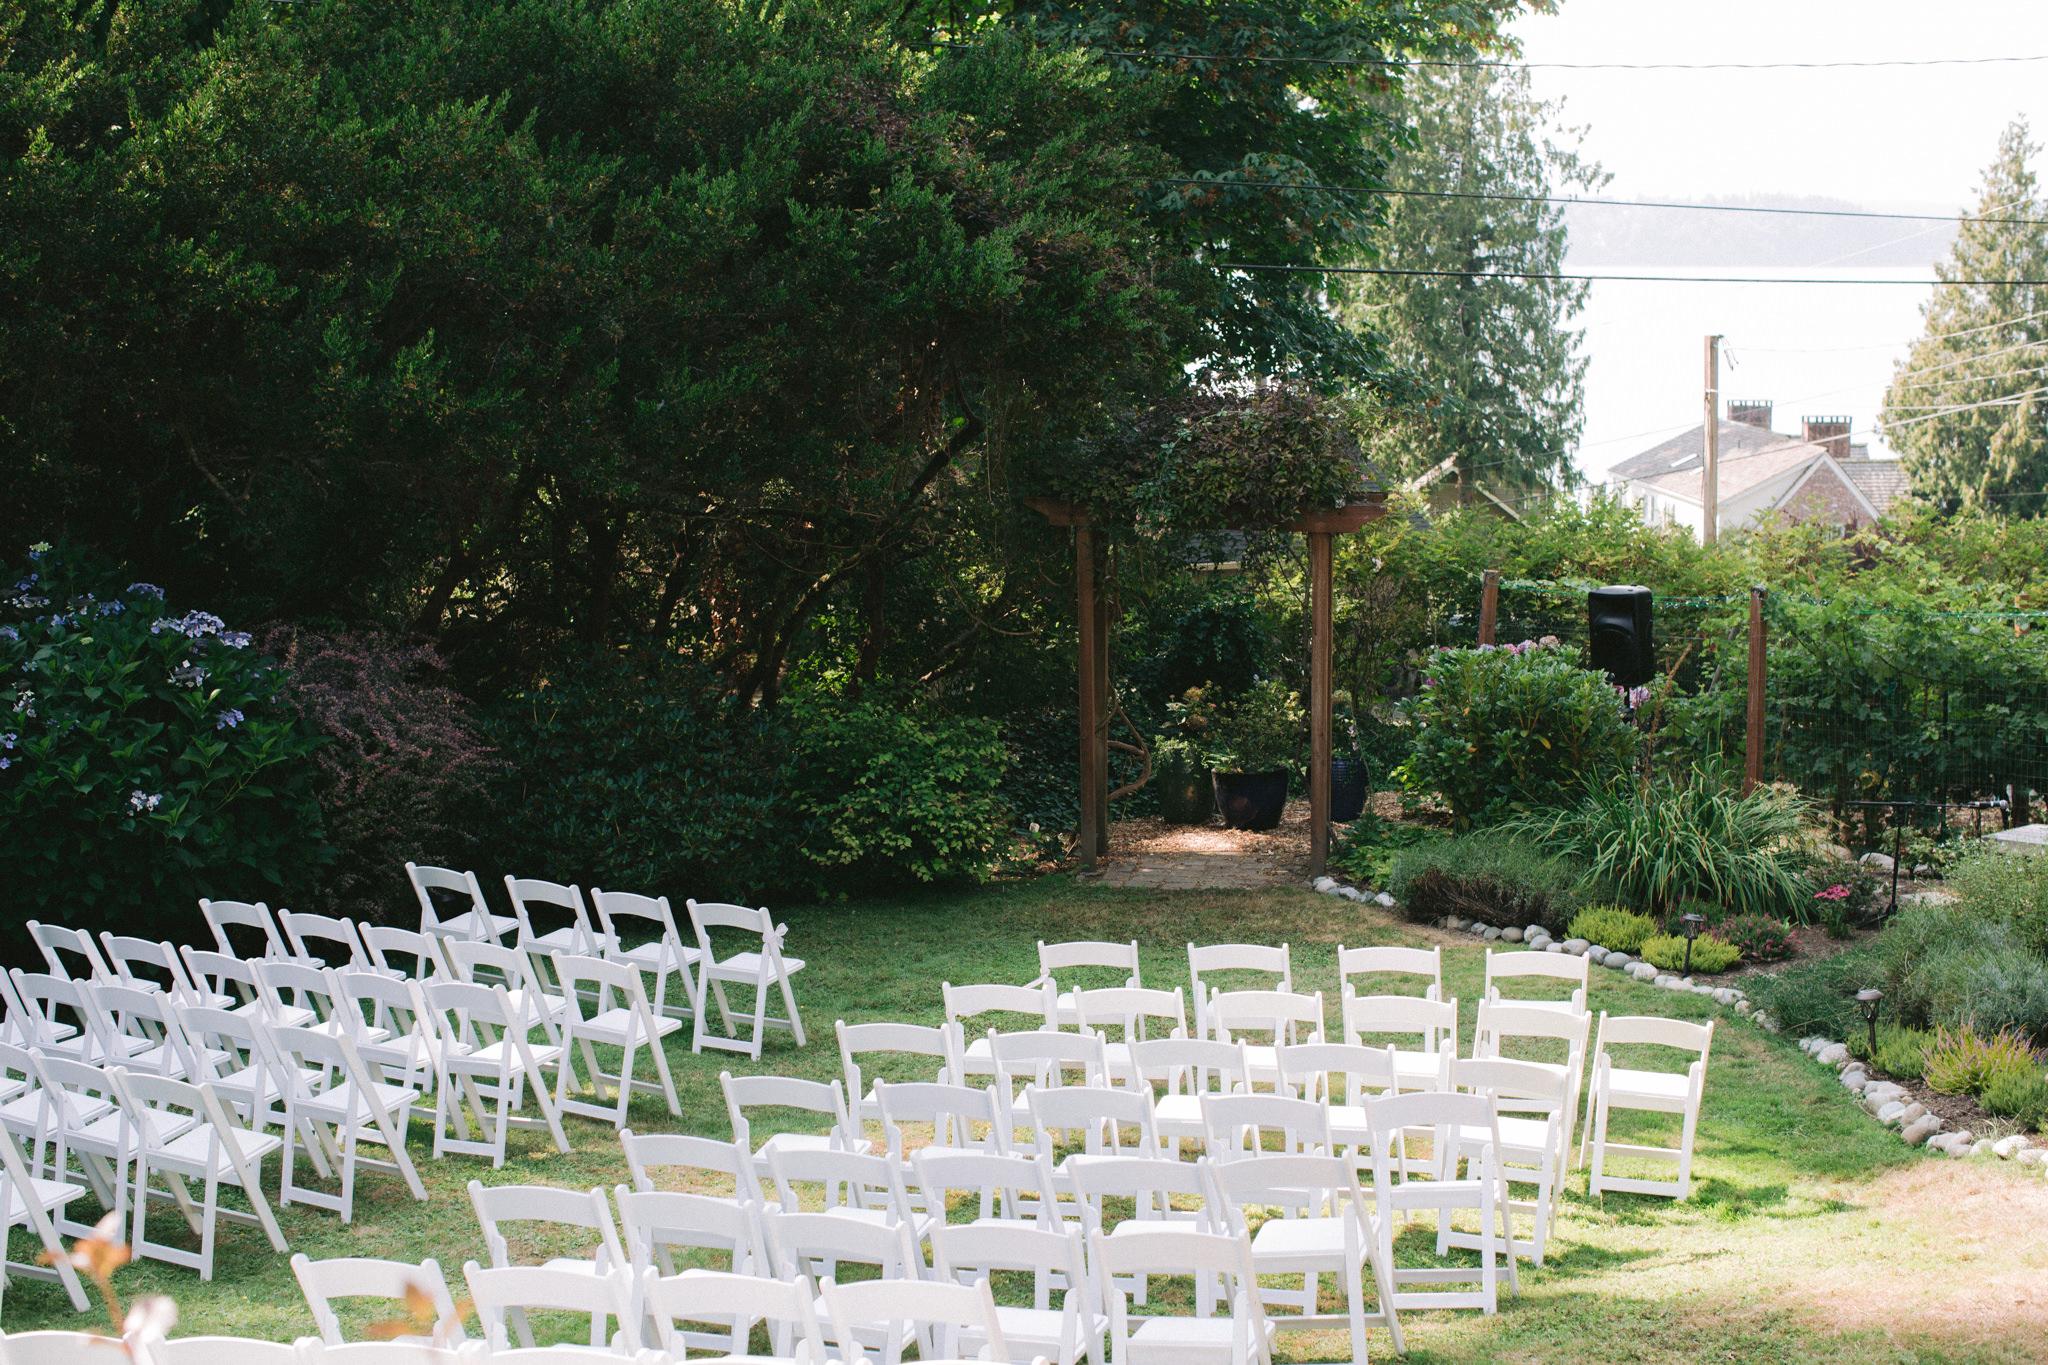 Backyard-Bainbridge-Island-Wedding-Alycia-Lovell-Photography-62.JPG